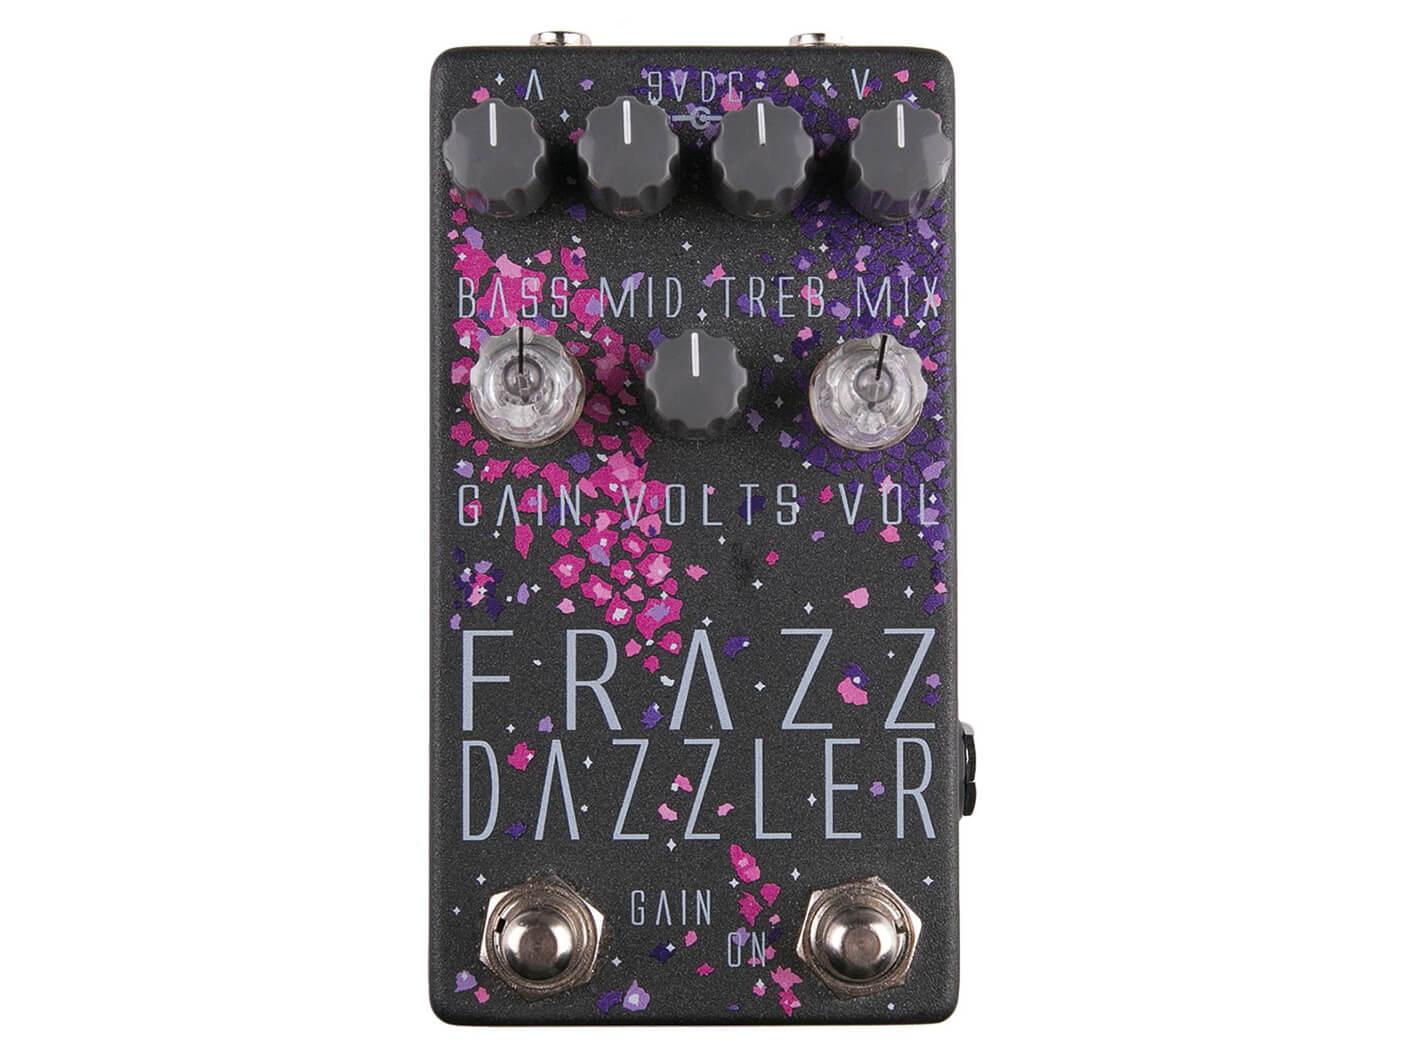 Dr Scientist Frazz Drazzler